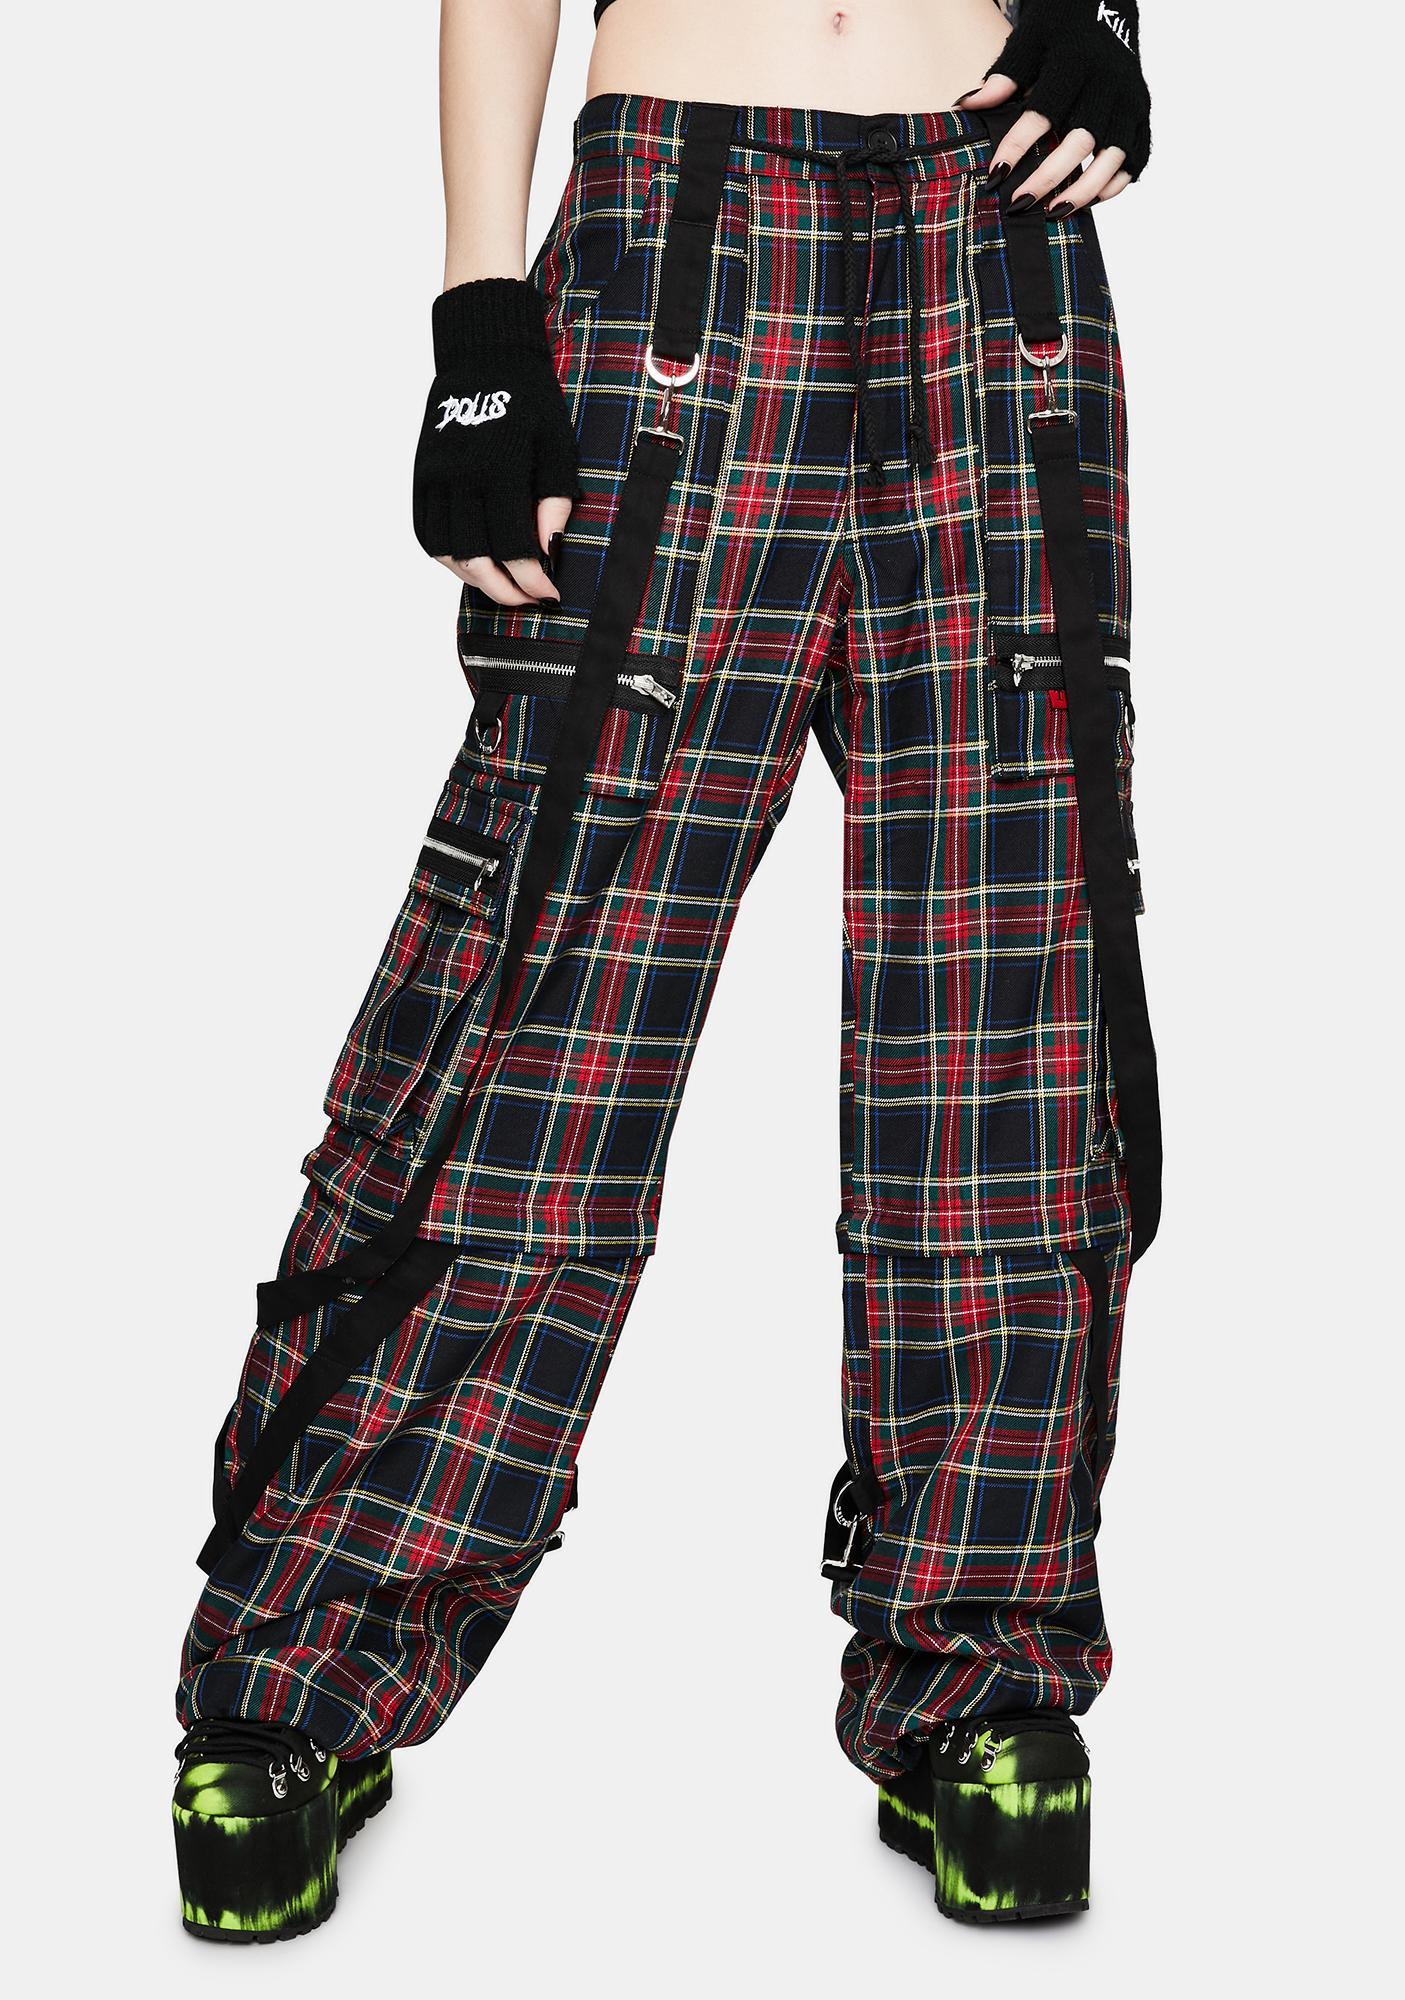 Tripp NYC Strap To Strap Plaid Pants